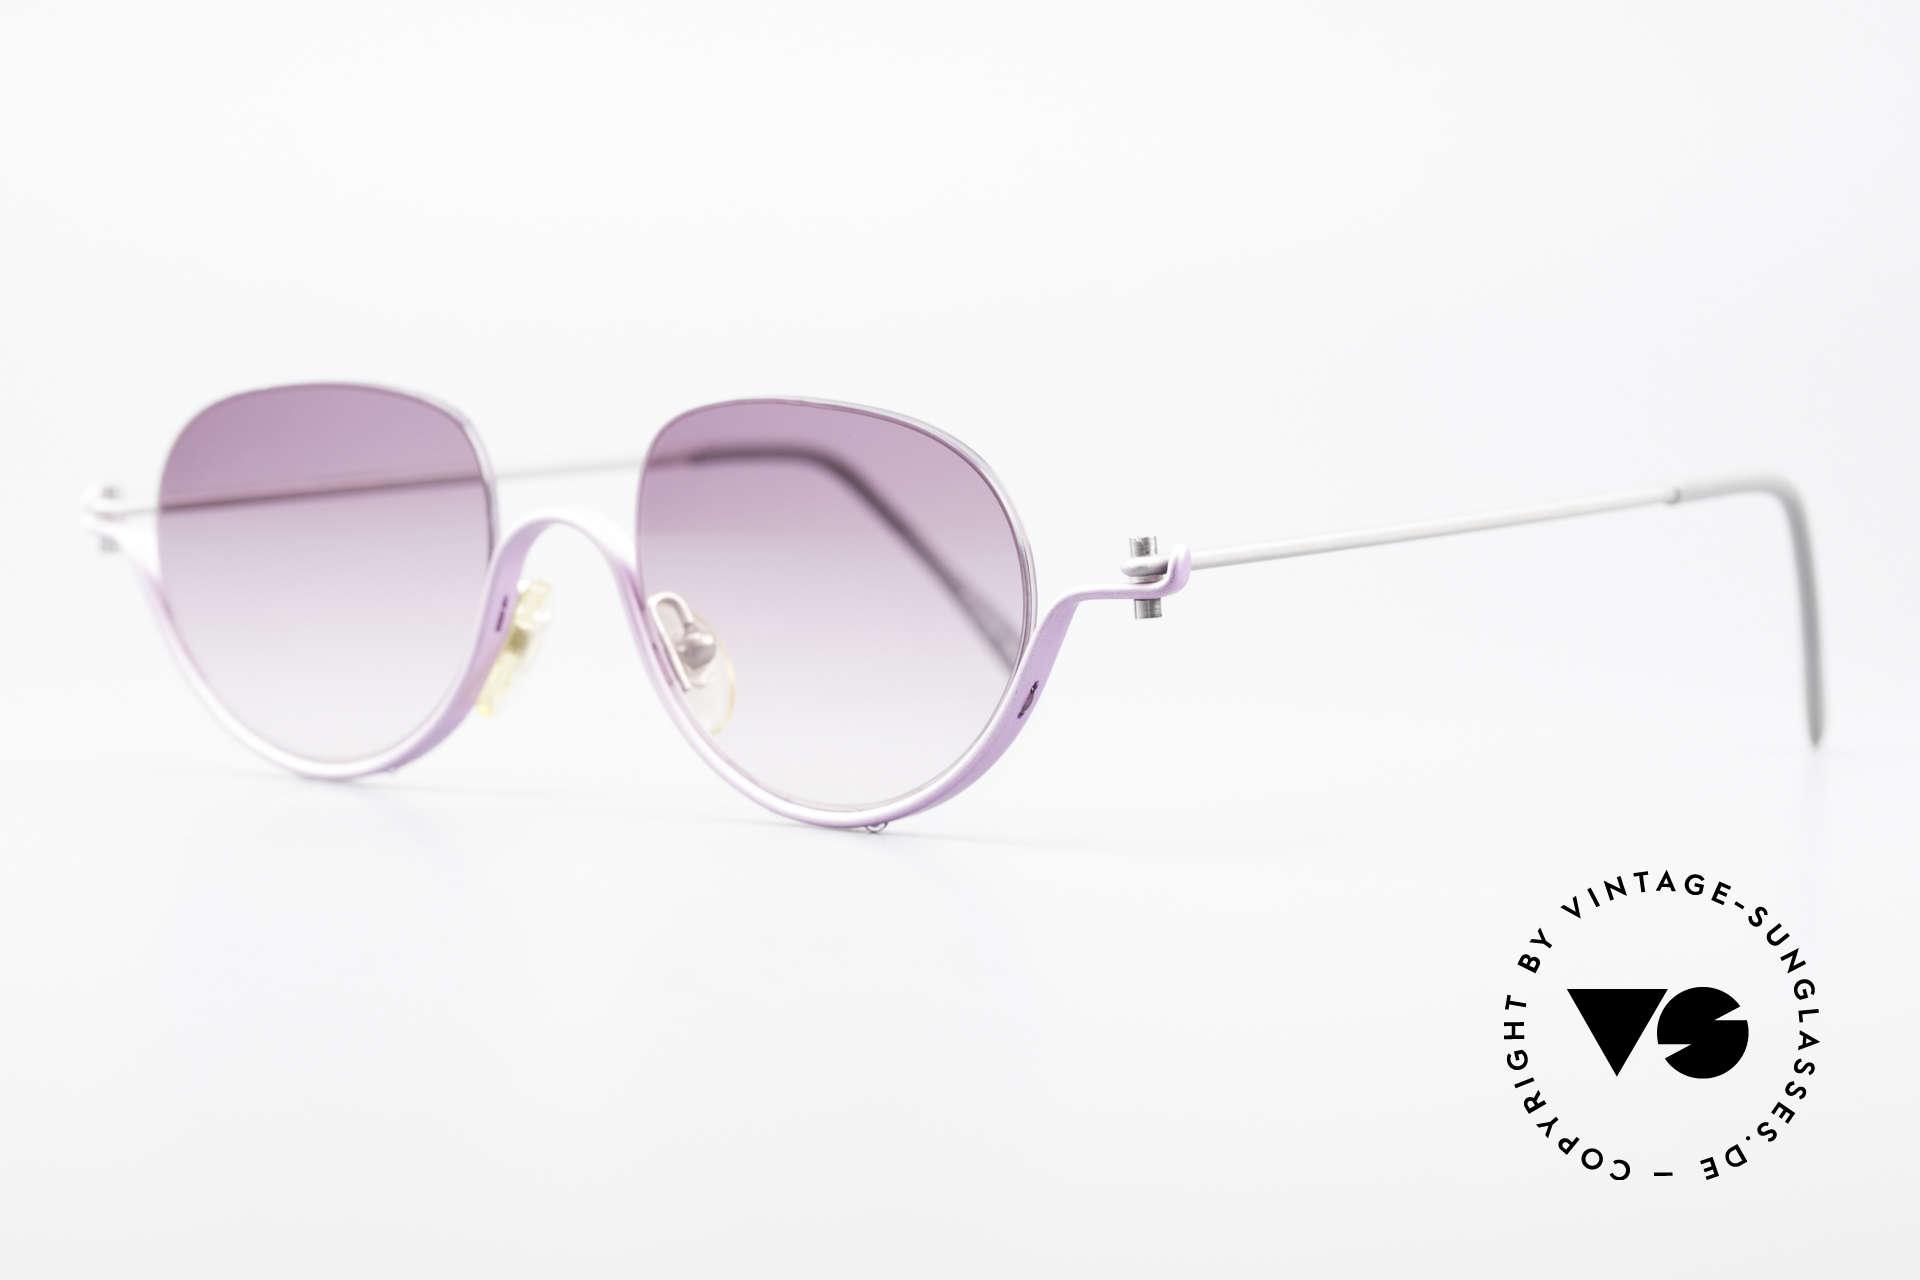 ProDesign No8 Gail Spence Design Shades, successor of the legendary Pro Design N° ONE model, Made for Women